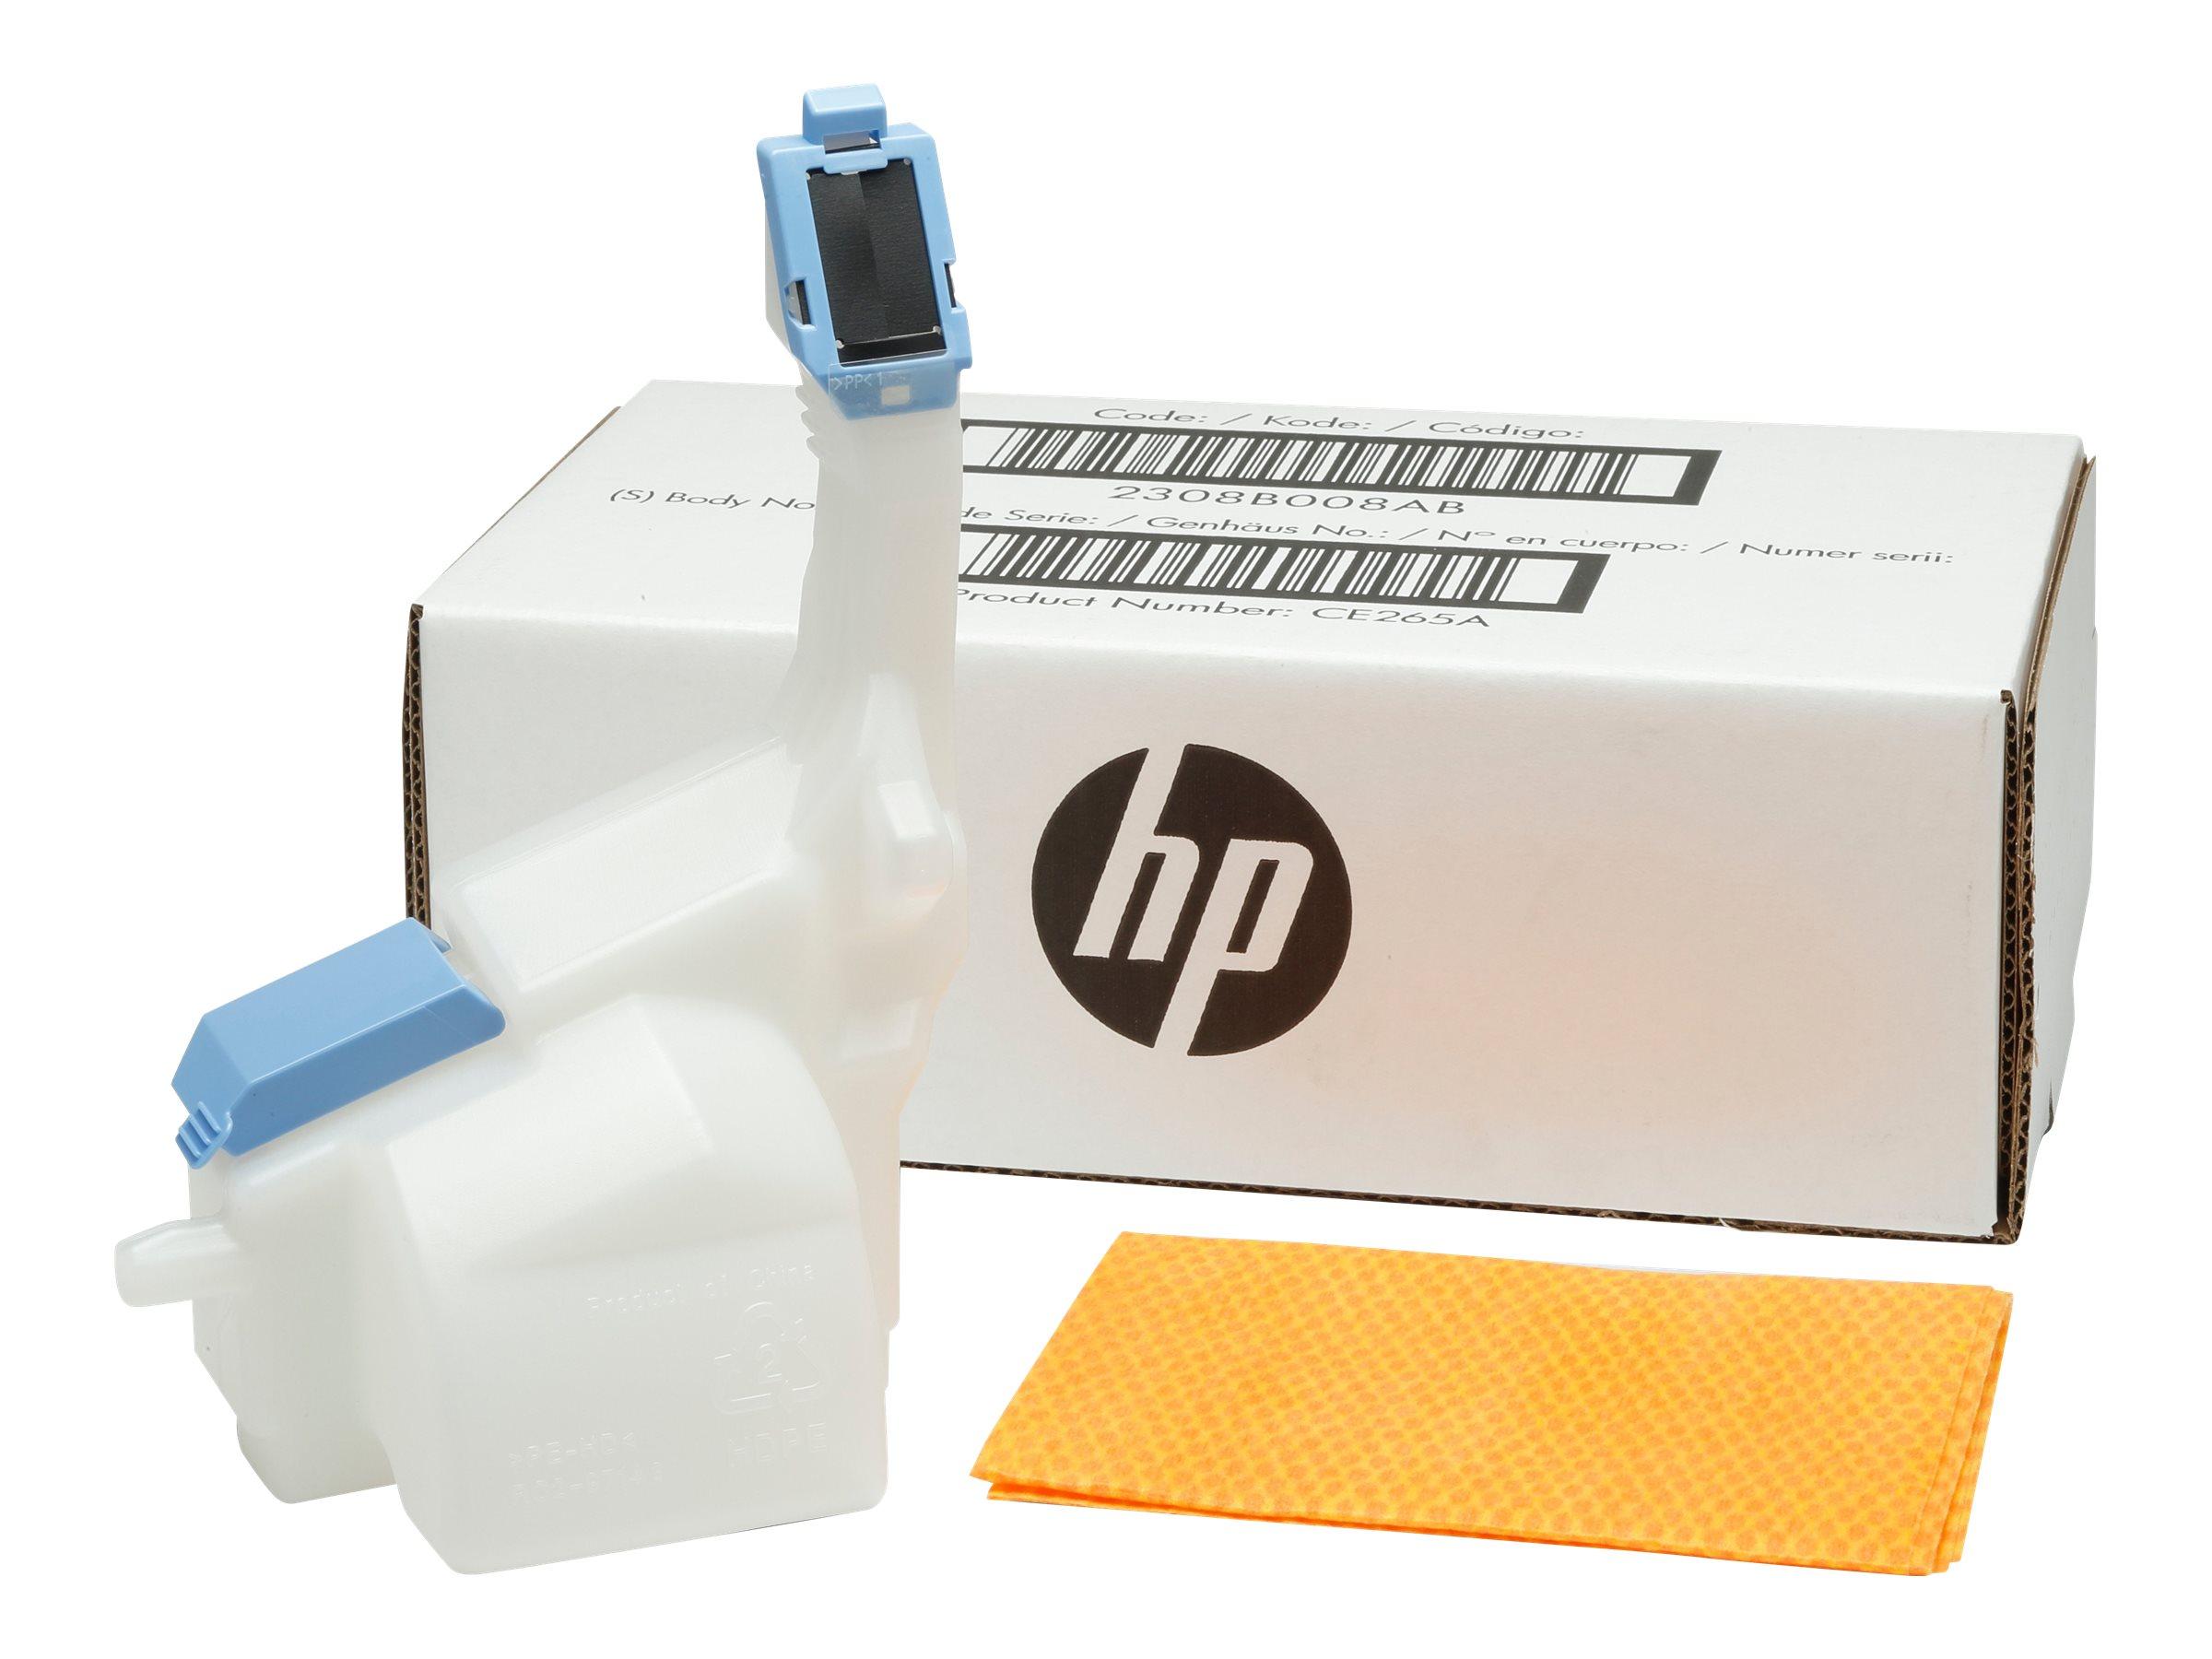 HP Toner Collection Unit - Tonersammler - für LaserJet Enterprise MFP M680